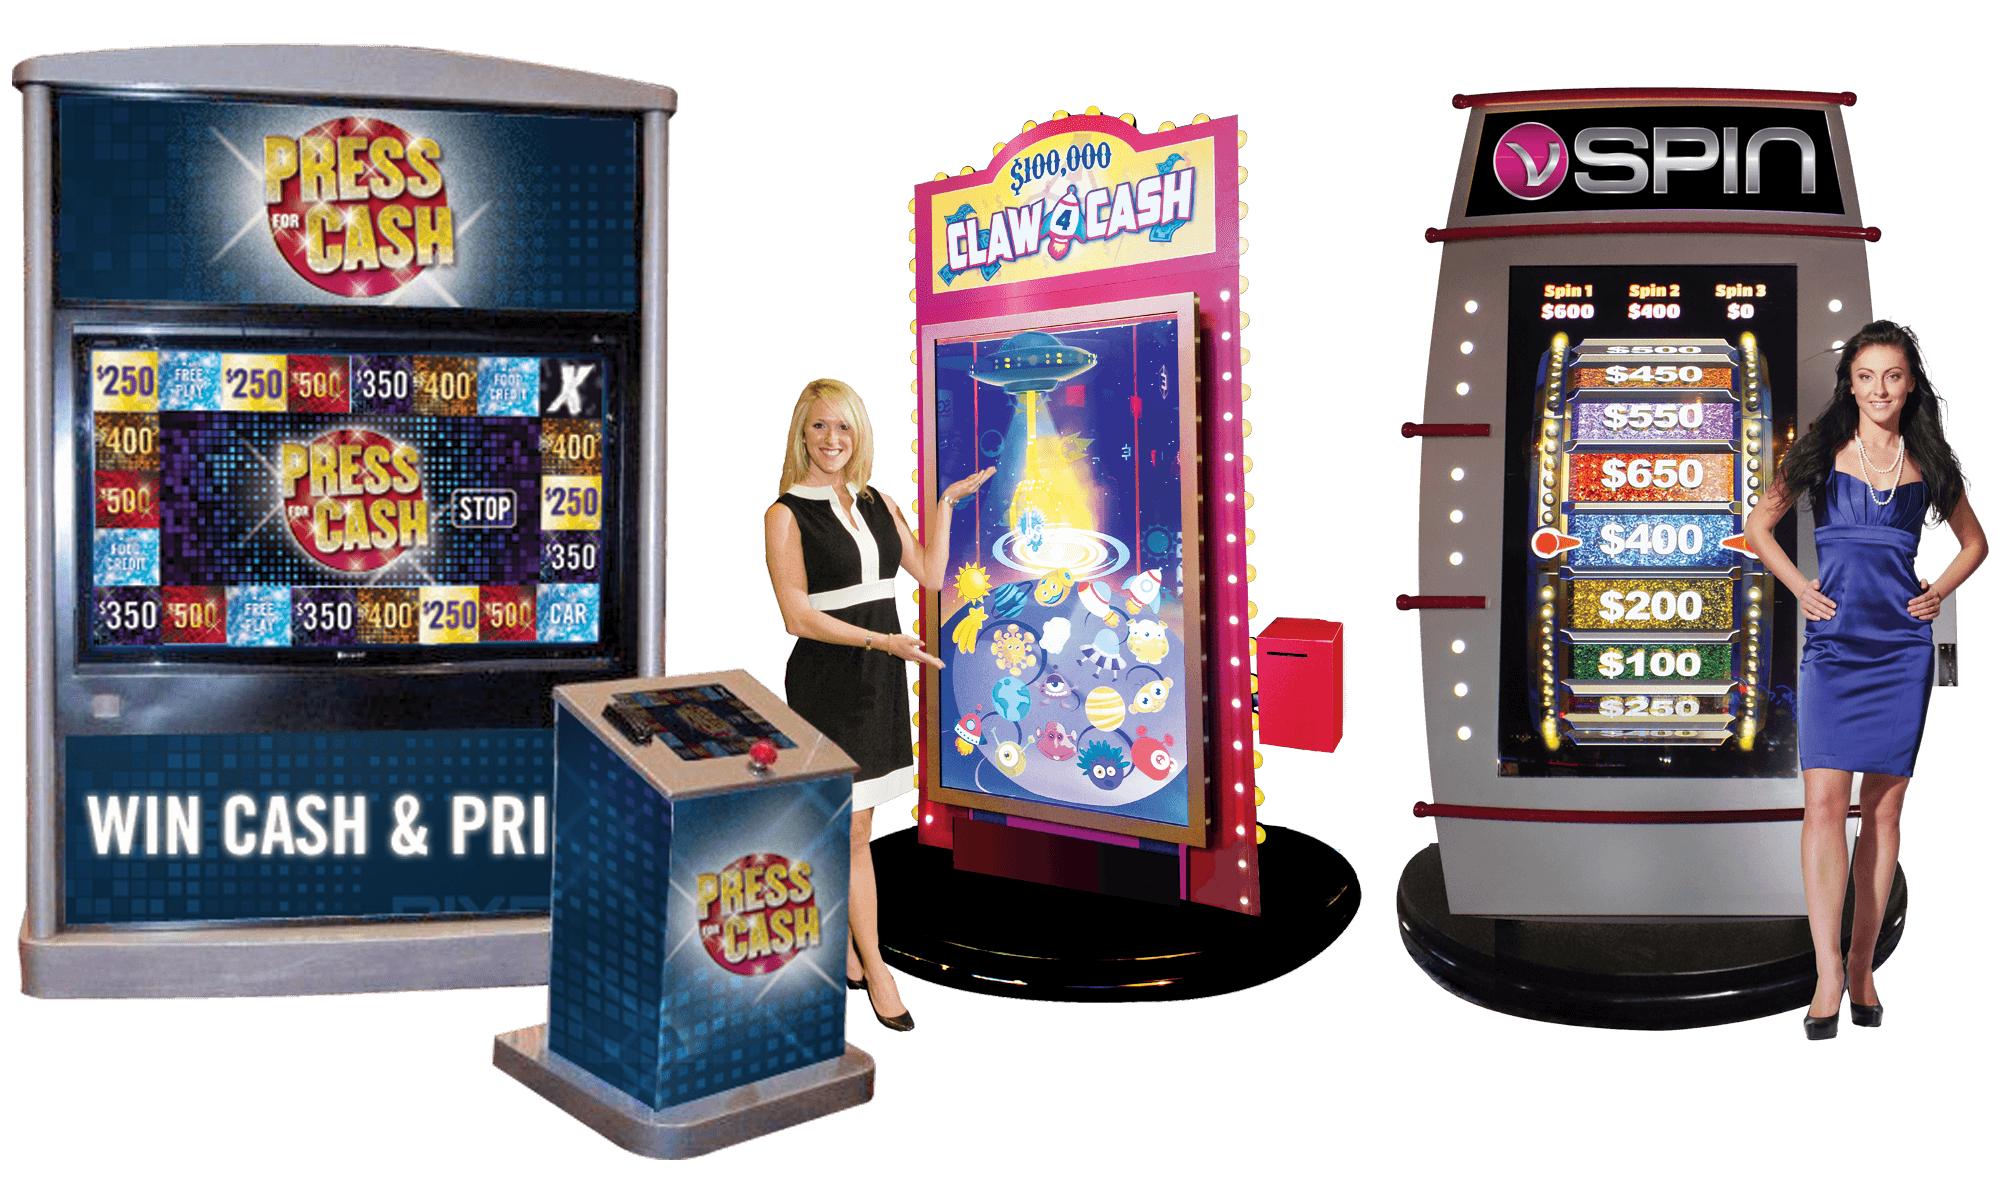 Slot machine promotional items cipro hotel kaya artemis resort /u0026 casino